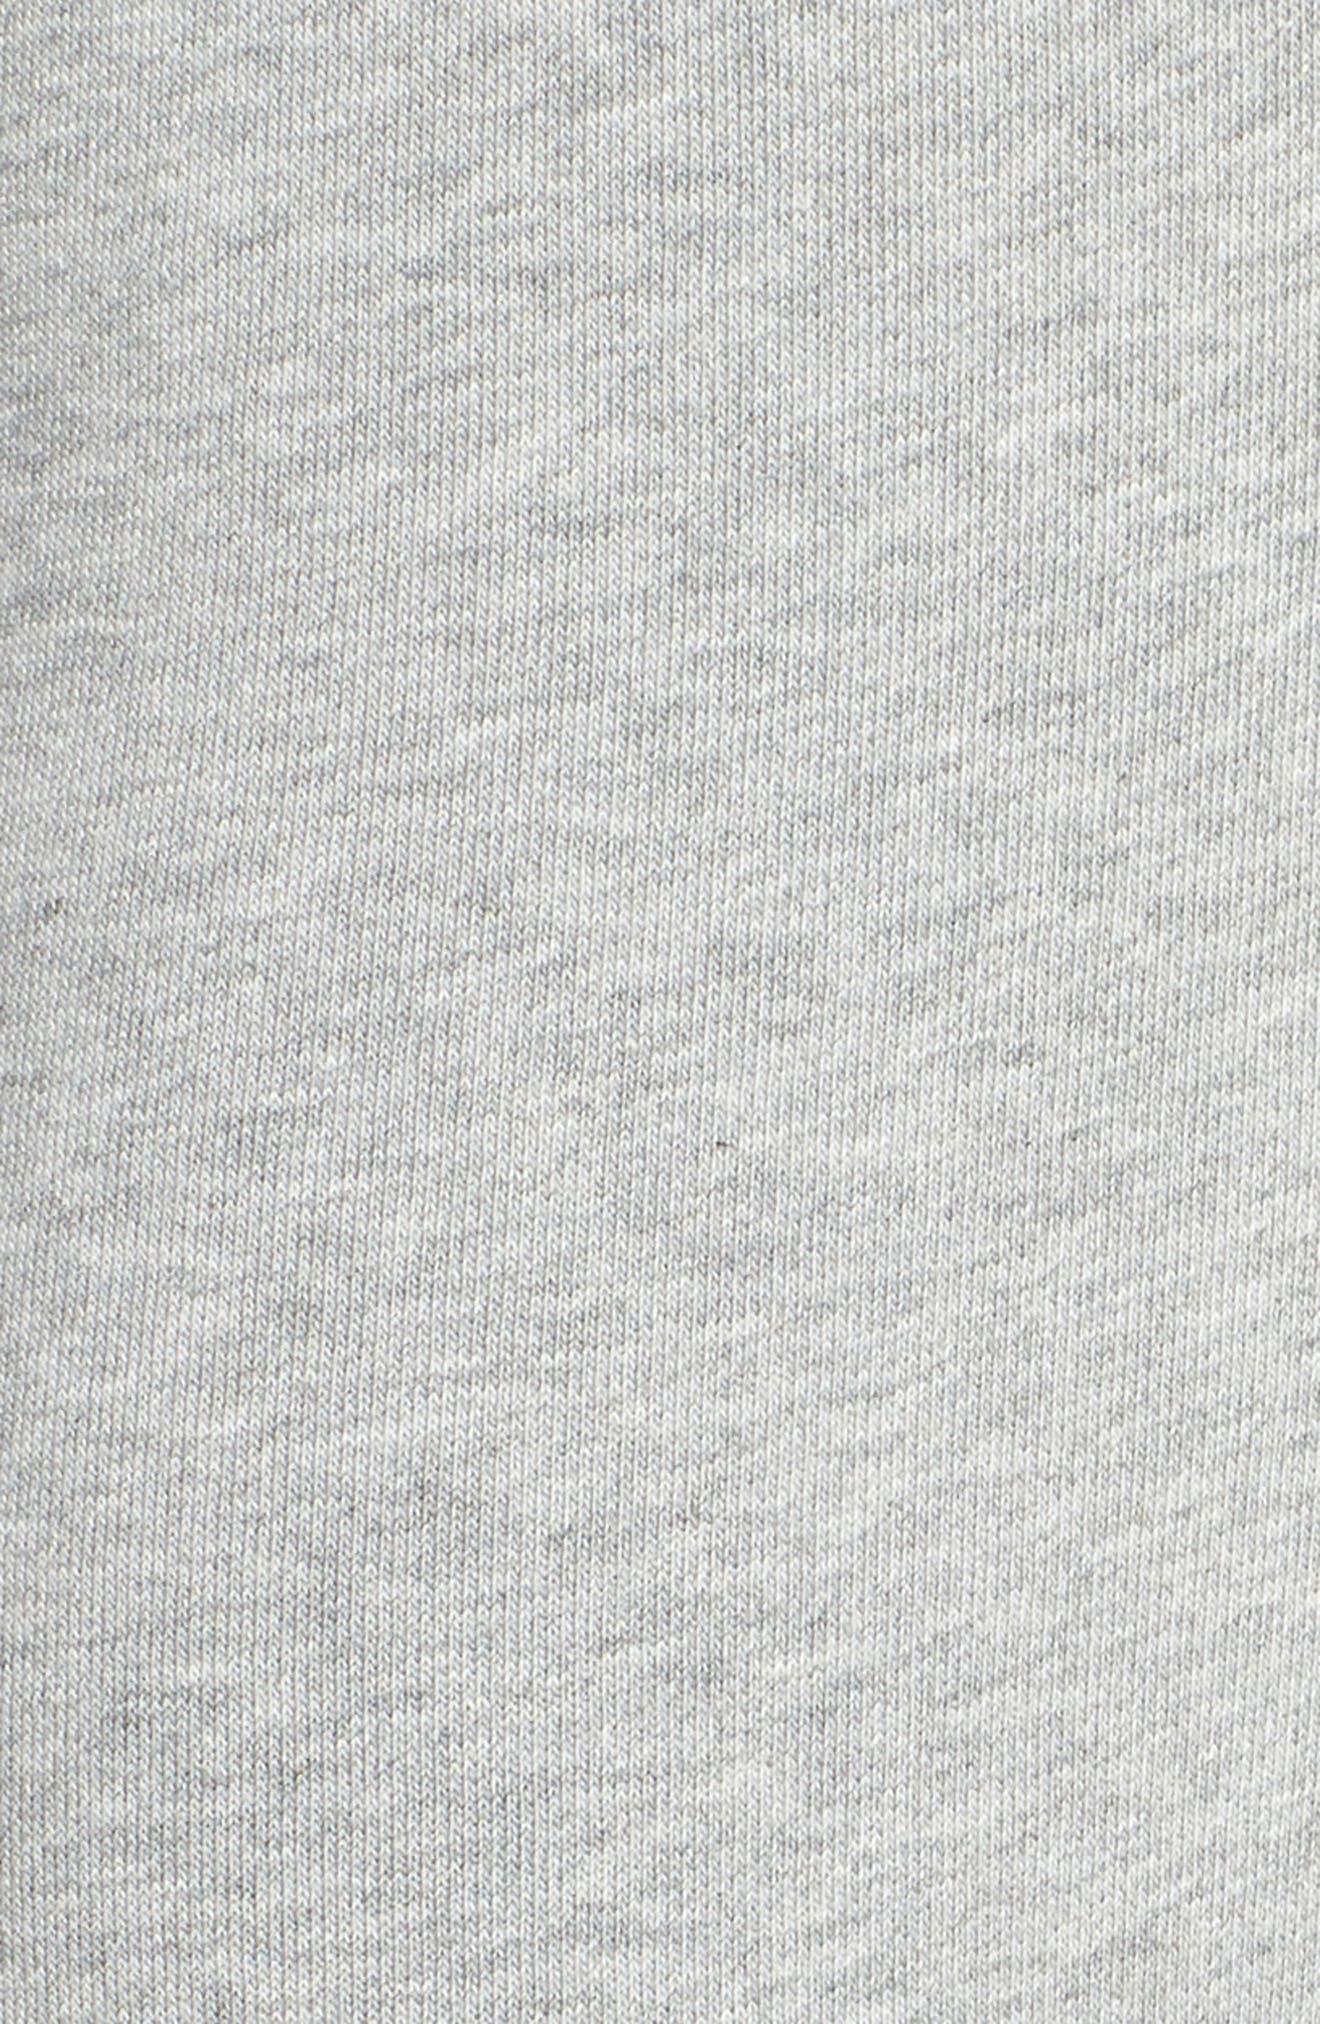 Tapered Training Pants,                             Alternate thumbnail 6, color,                             DARK GREY HEATHER/ BLACK